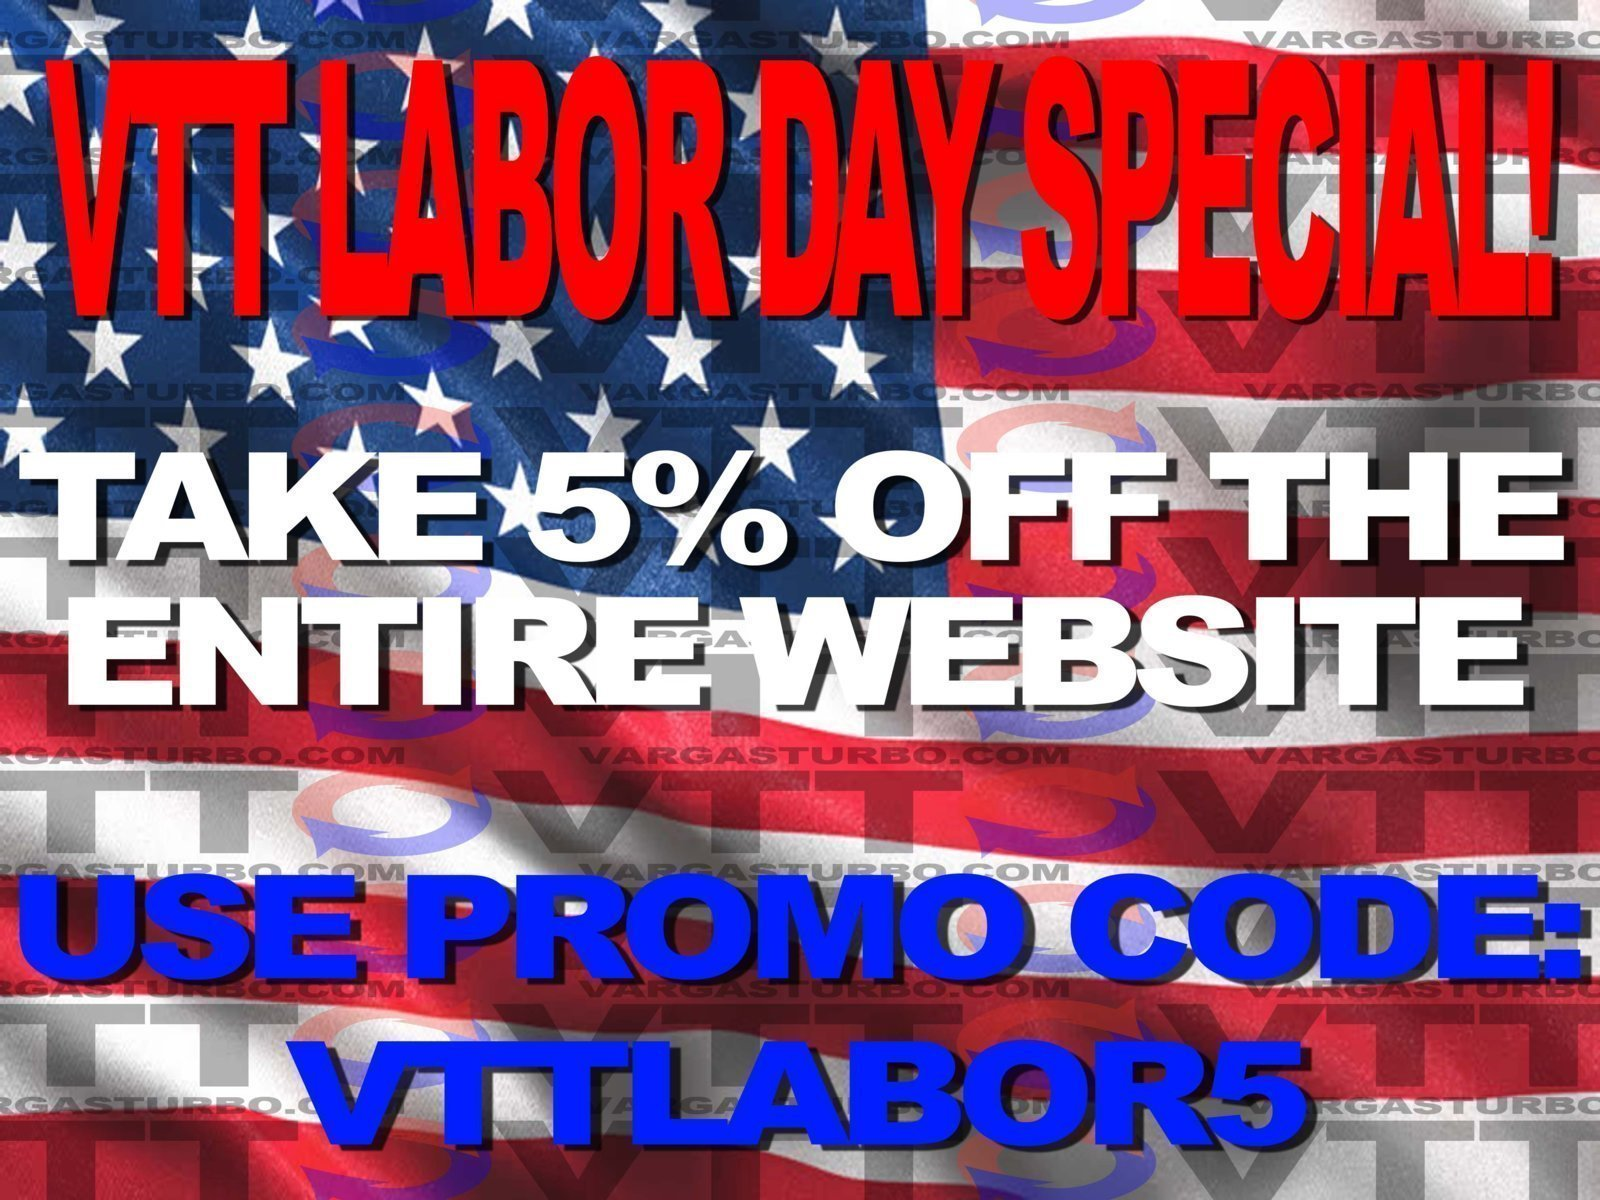 VTT Labor day 5 percent.jpg